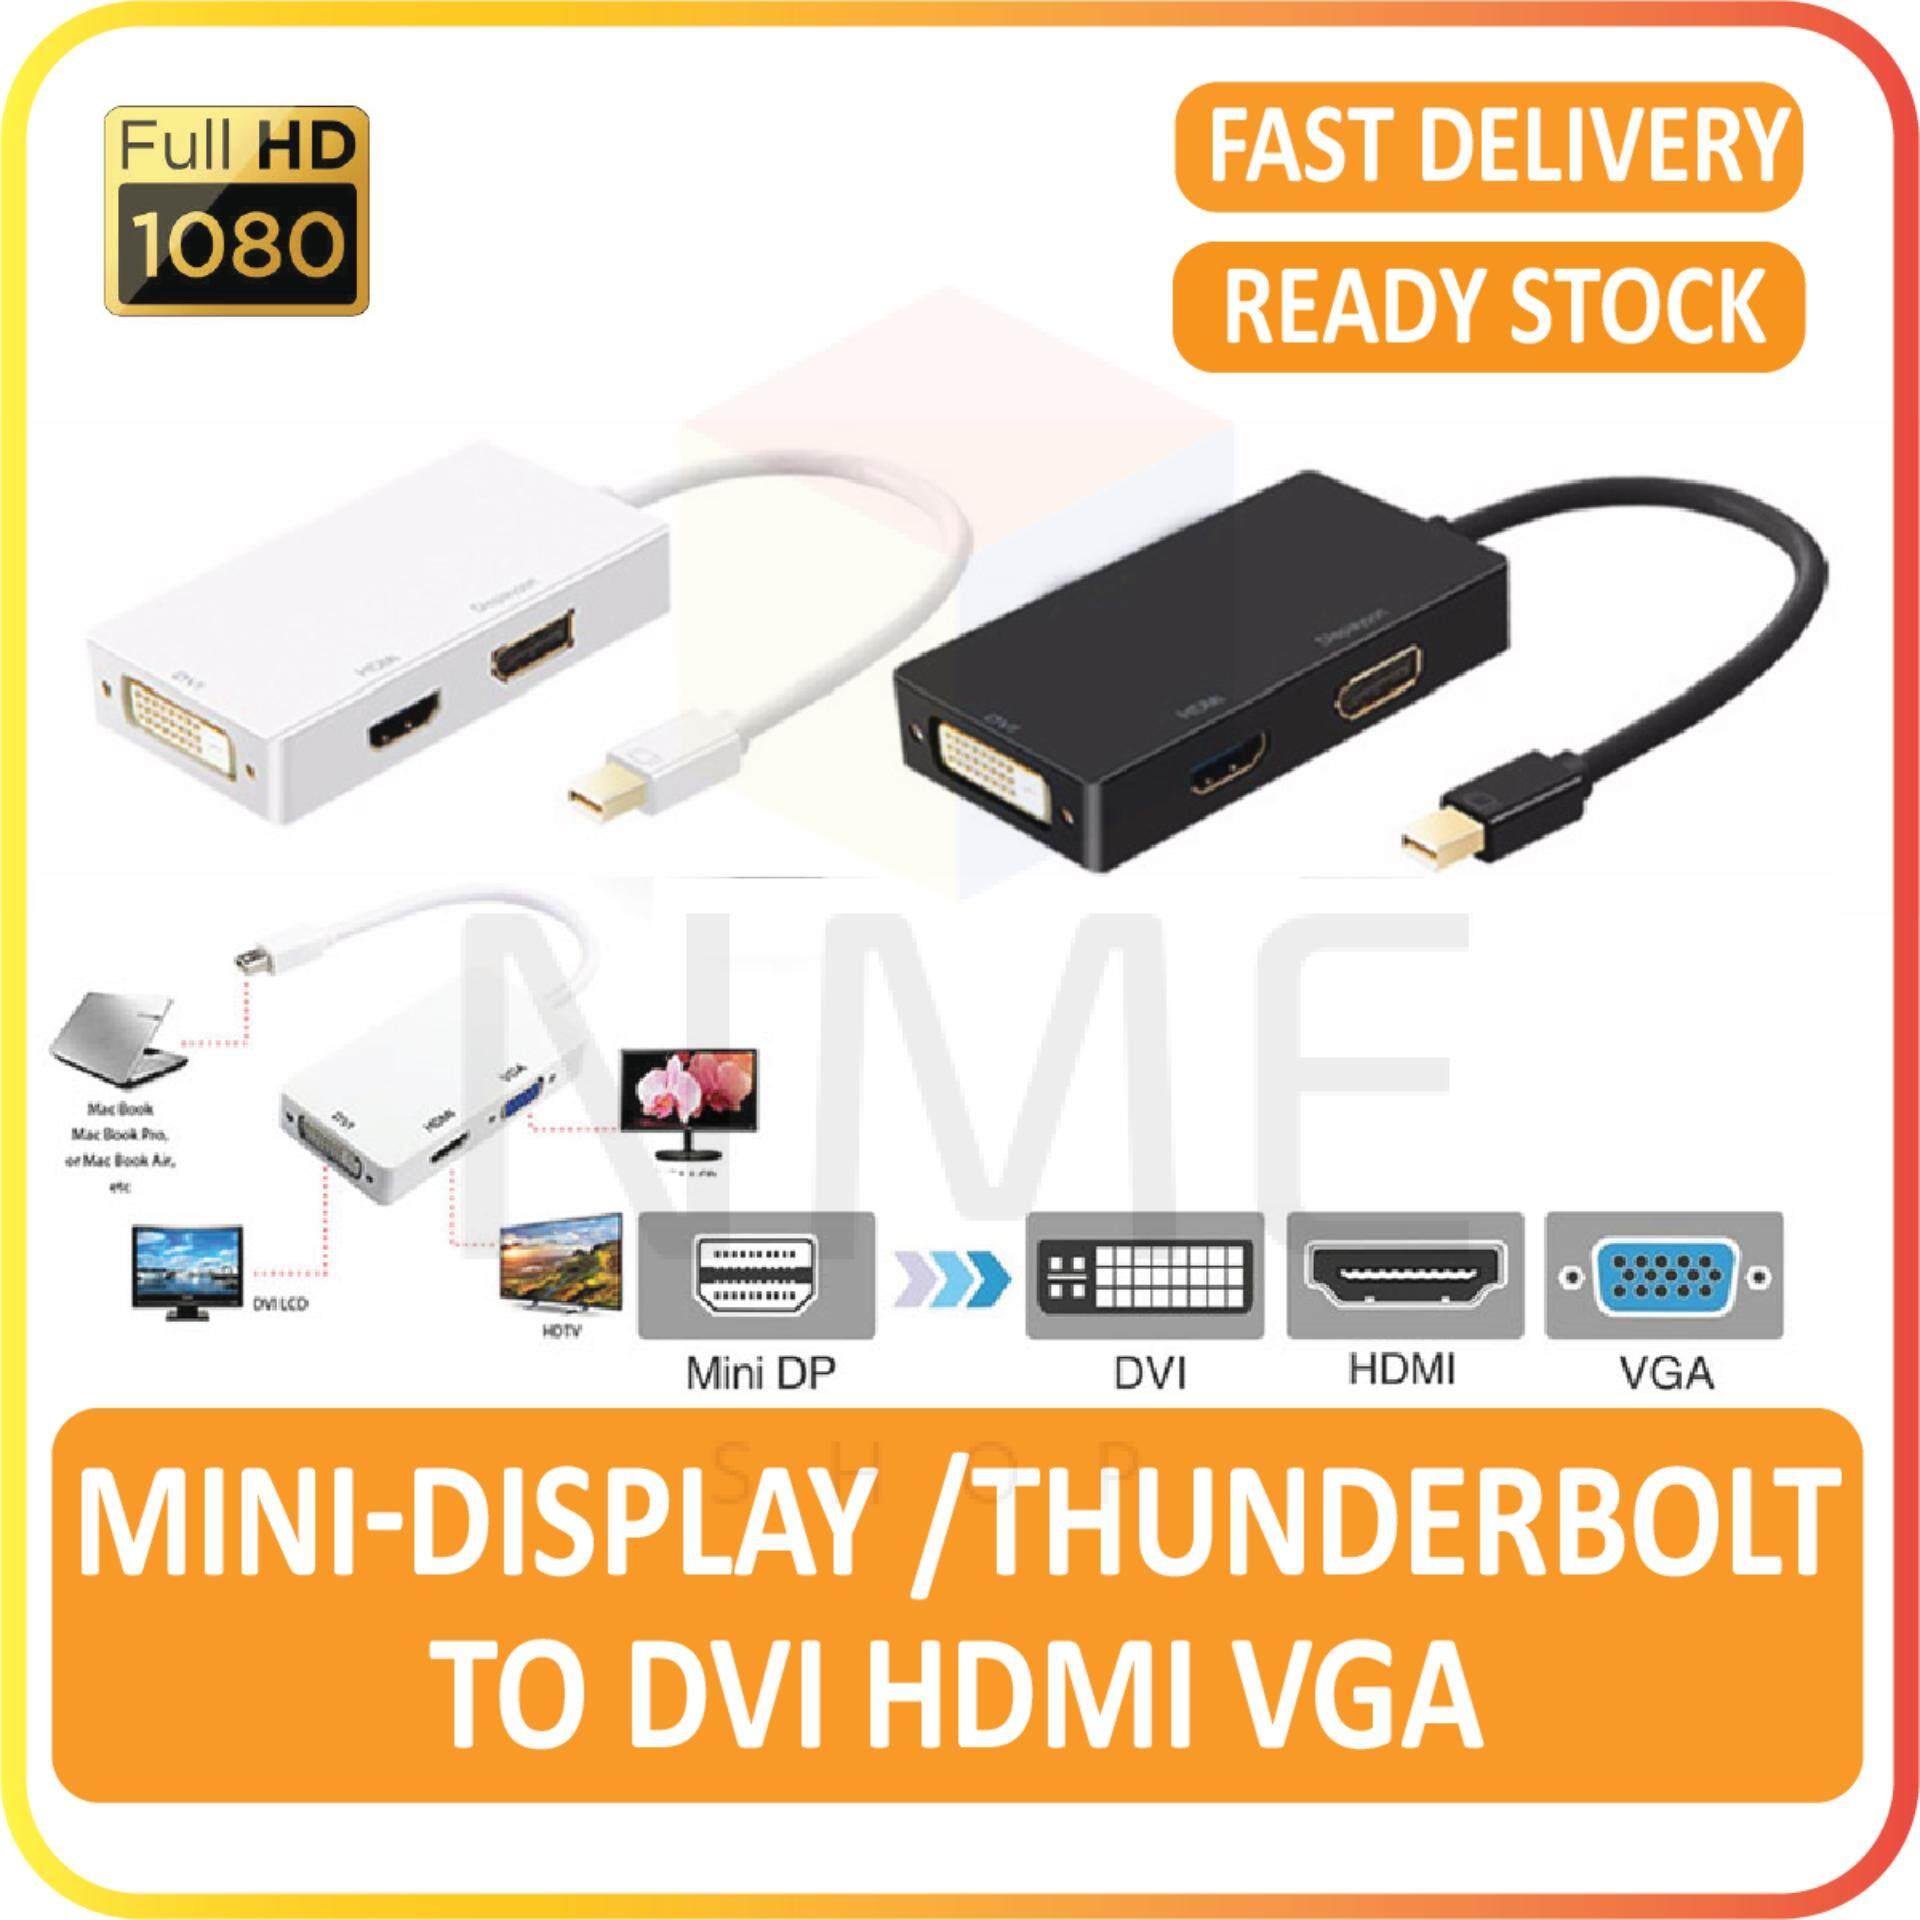 3 In 1 Mini DisplayPort / Thunderbolt Port To DVI HDMI VGA Full HD 1080P  Female Adapter Display Port Cable Converter for Computer, PC, Mac Book Air